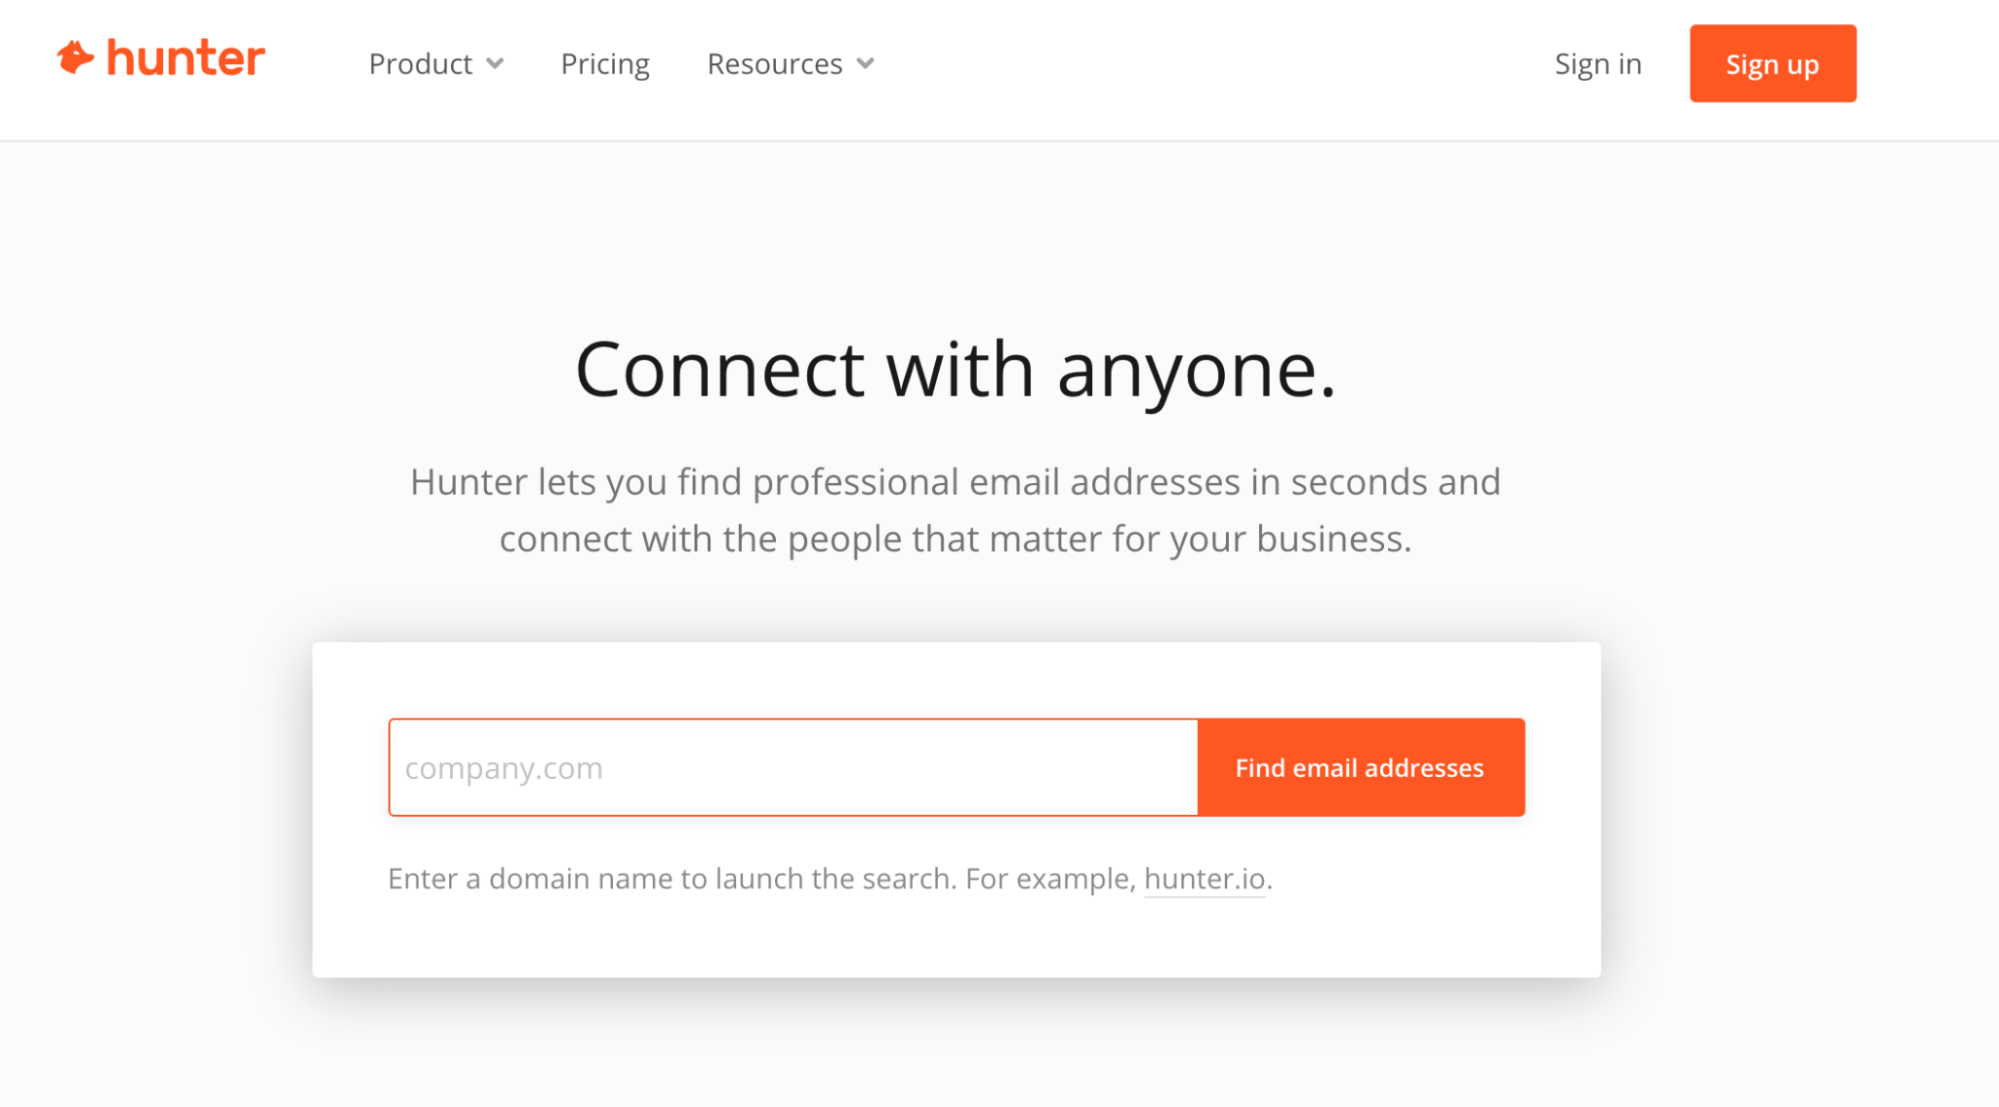 SaaS Marketing Automation Tools: Hunter Screenshot